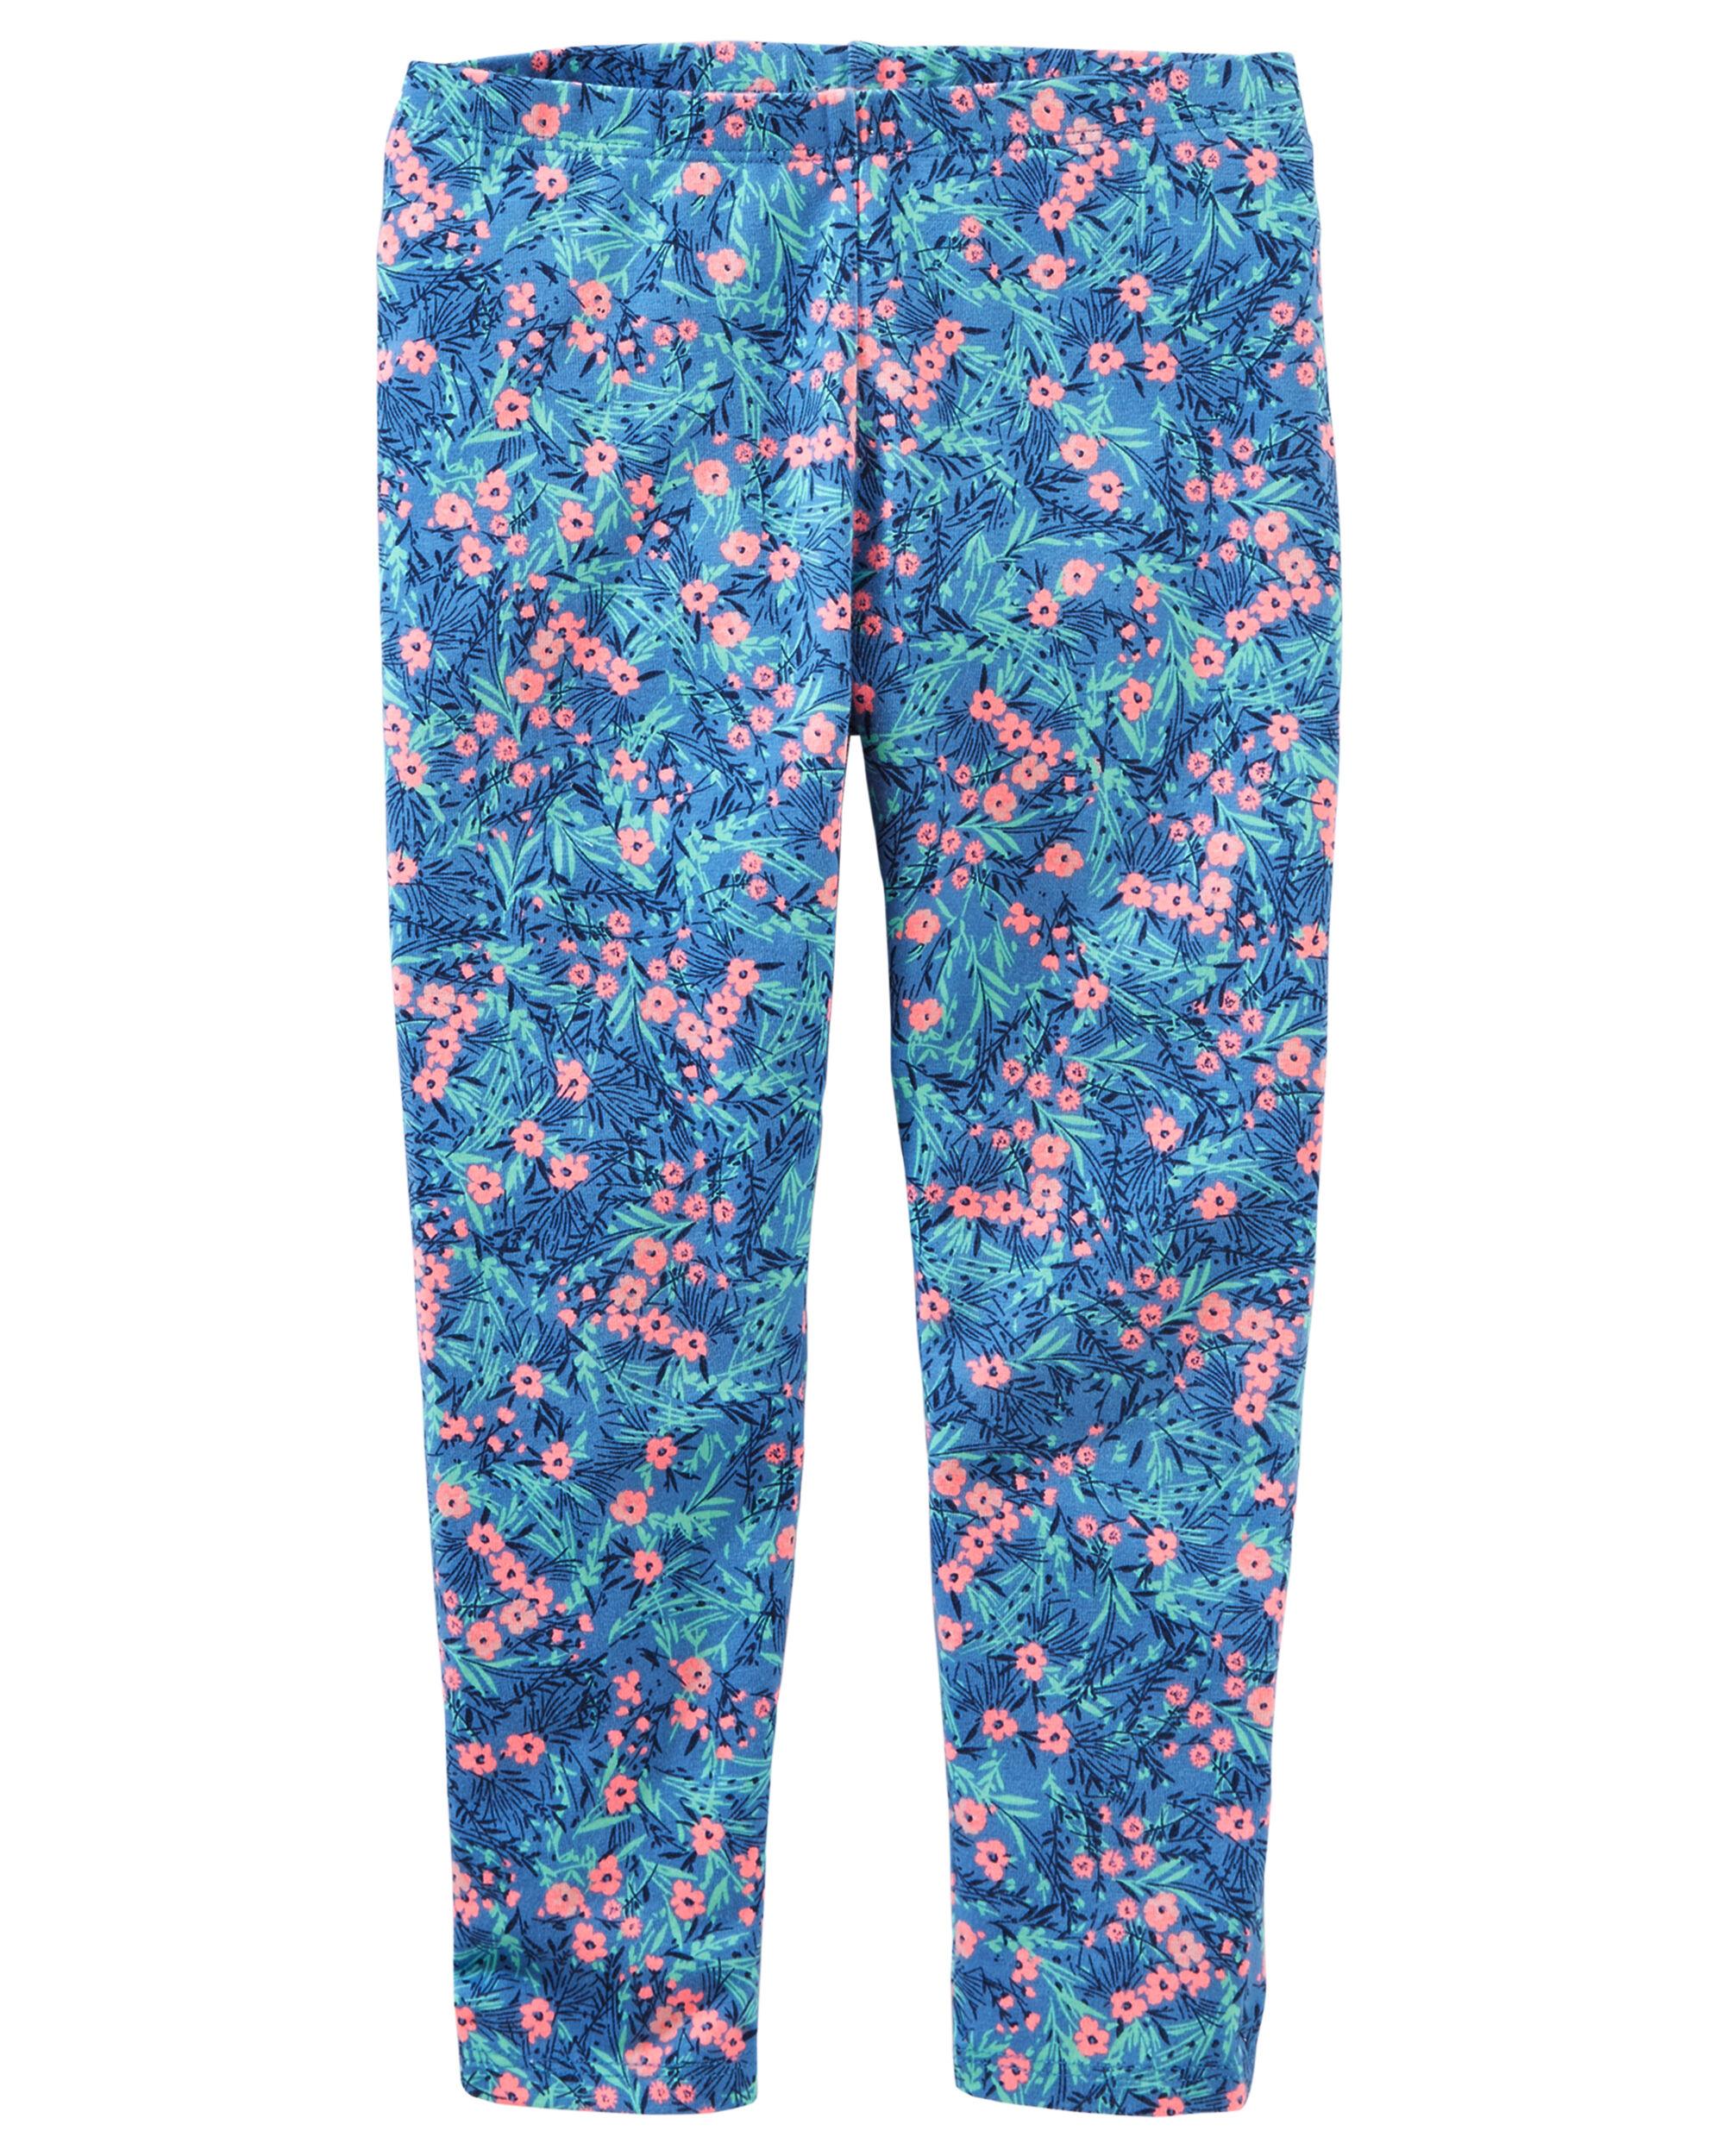 Mix Kit Ditsy Floral Print Leggings